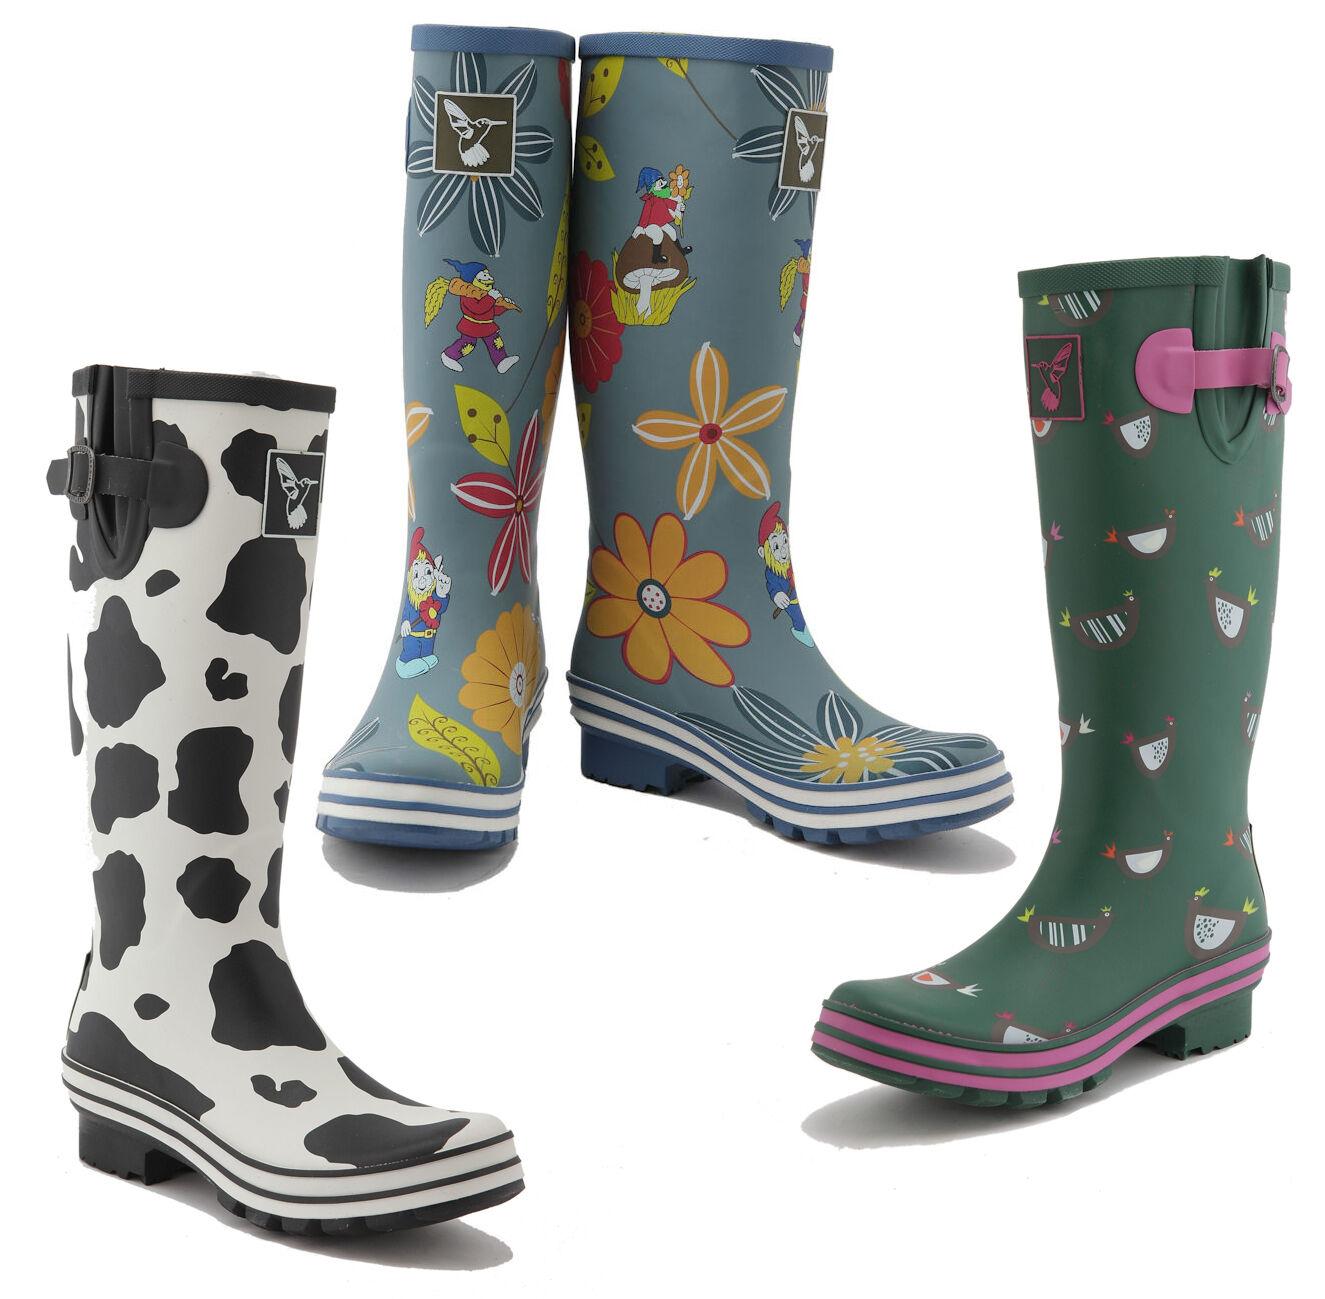 women Evercreatures Alto Stivali di gomma Stampa Animale Wellington -